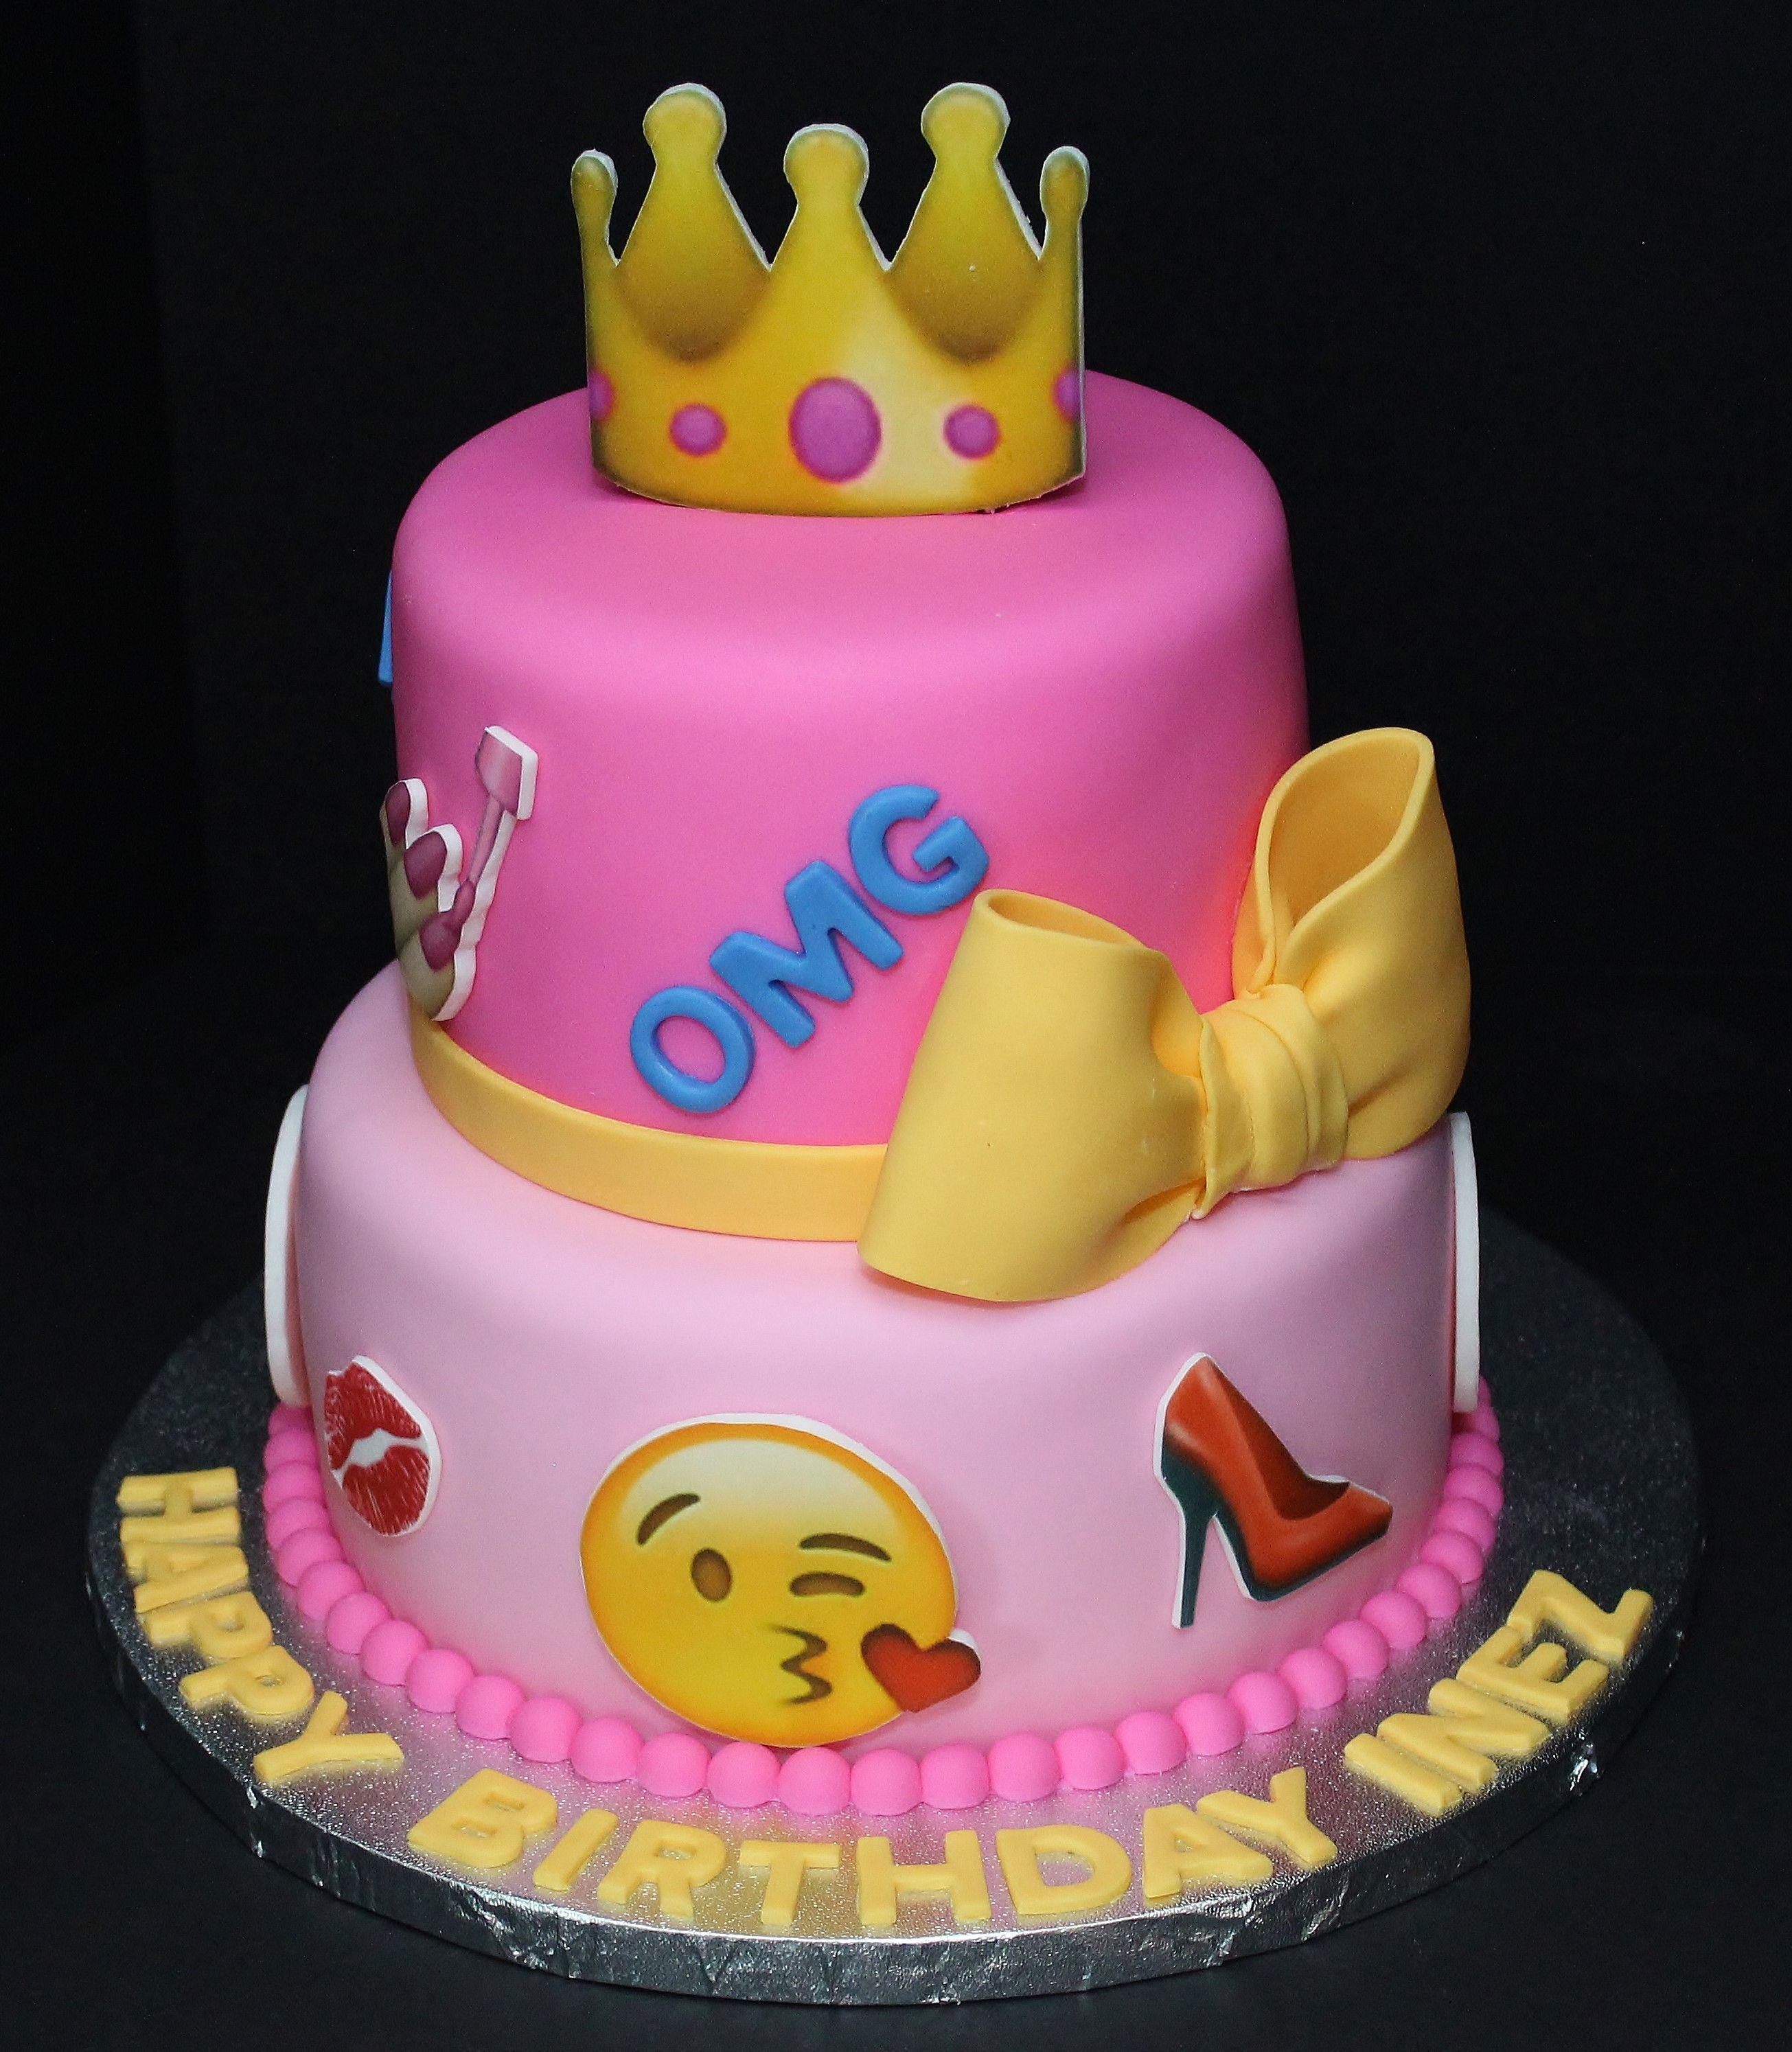 Emojis Cake by Cecy Huezo and Marina Lamb www